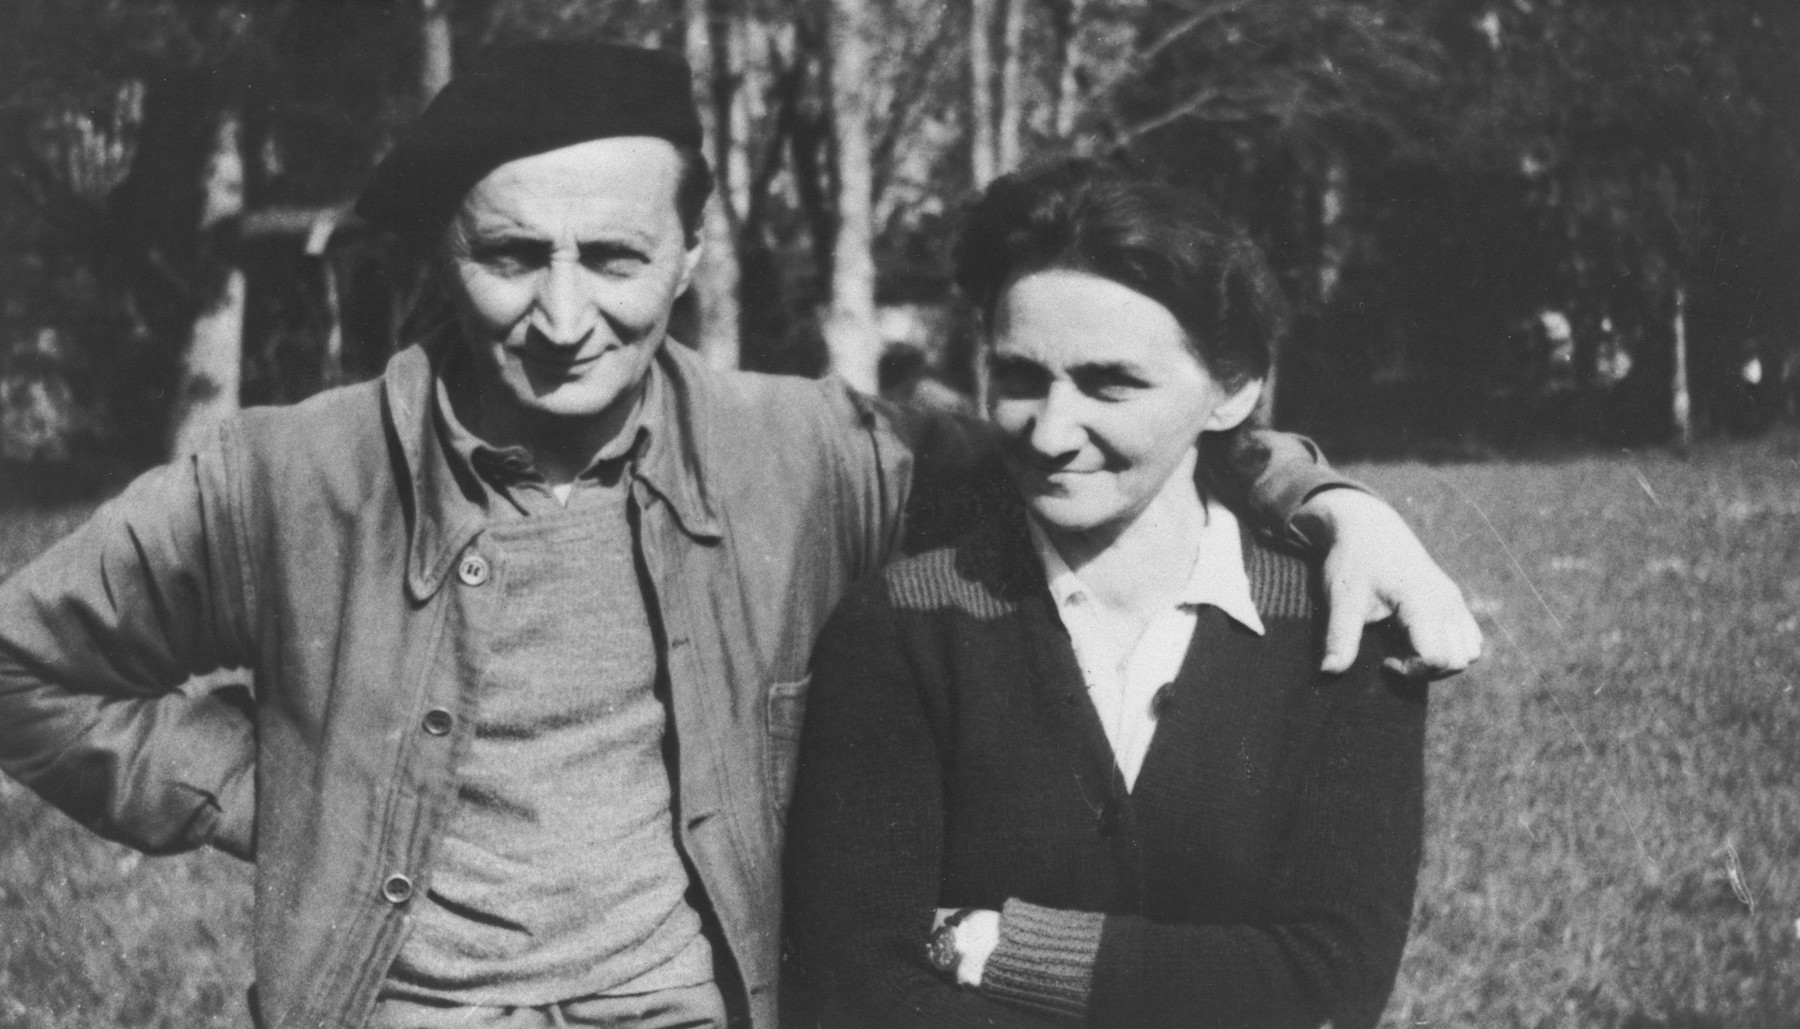 Portrait of Samuel and Ida Wetzler, Jewish associates of Joseph Fisera.  They were arrested but freed with Fisera's help.